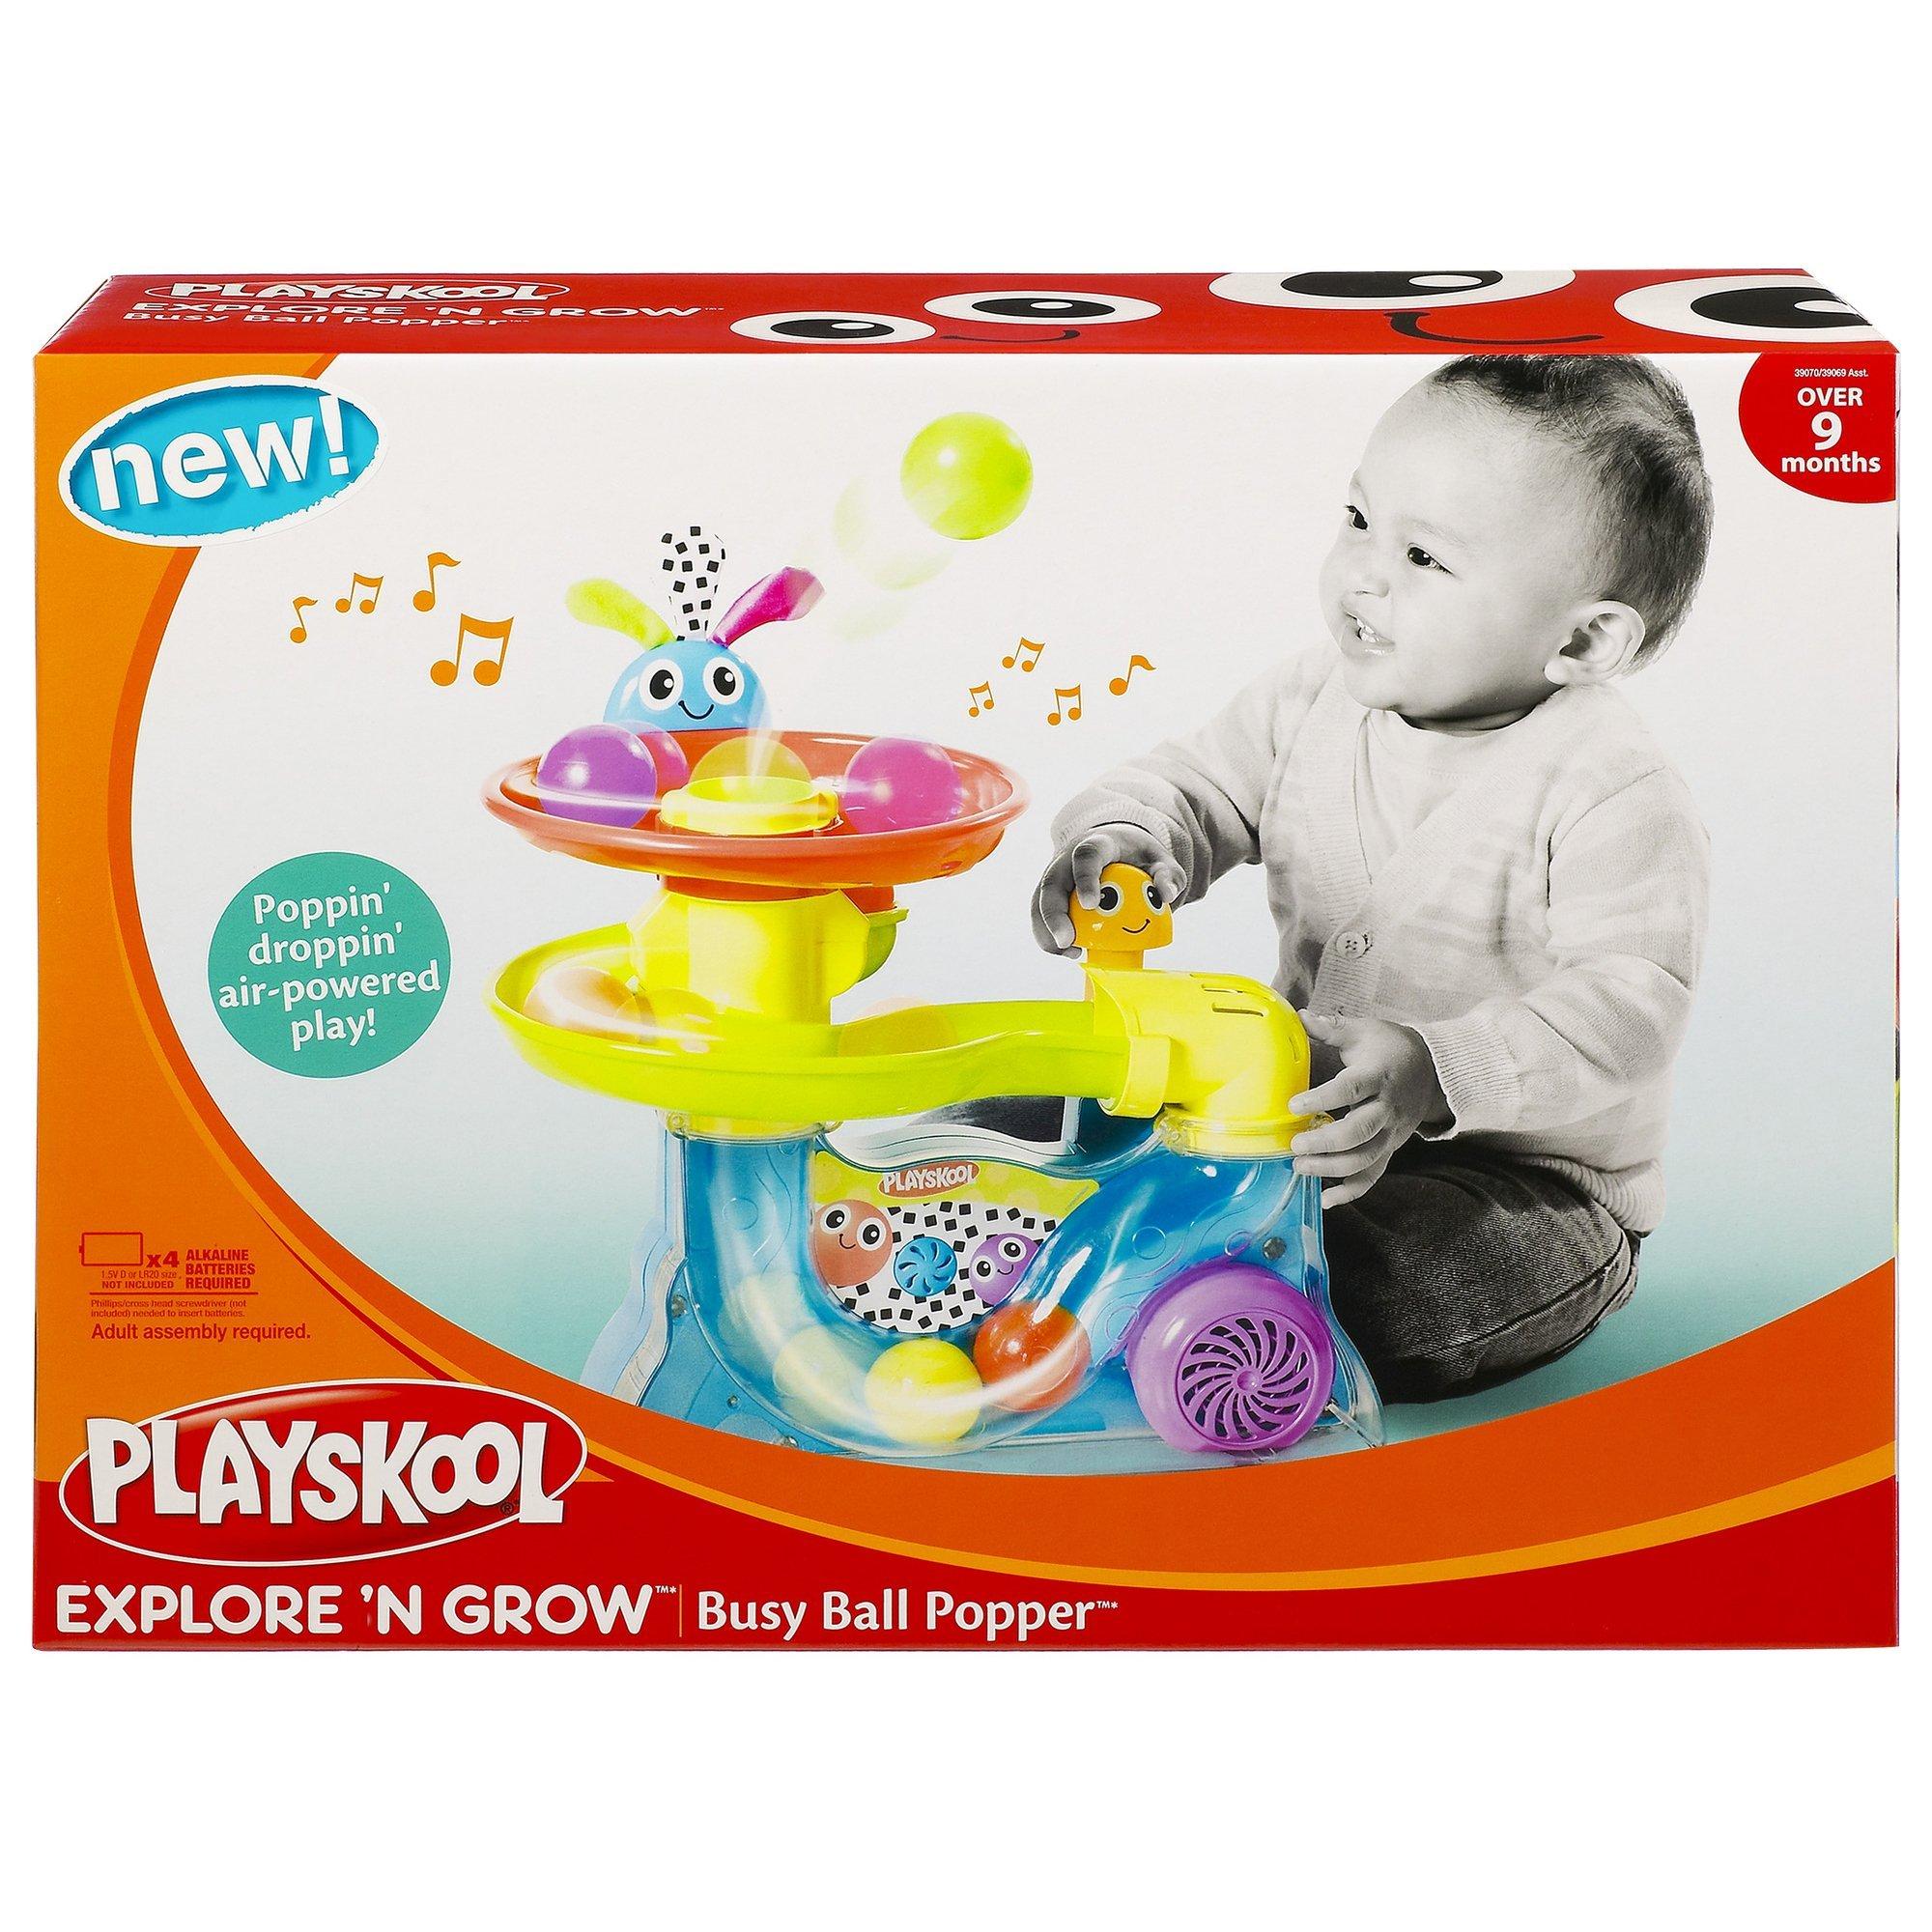 Playskool Explore N' Grow Busy Ball Popper | eBay